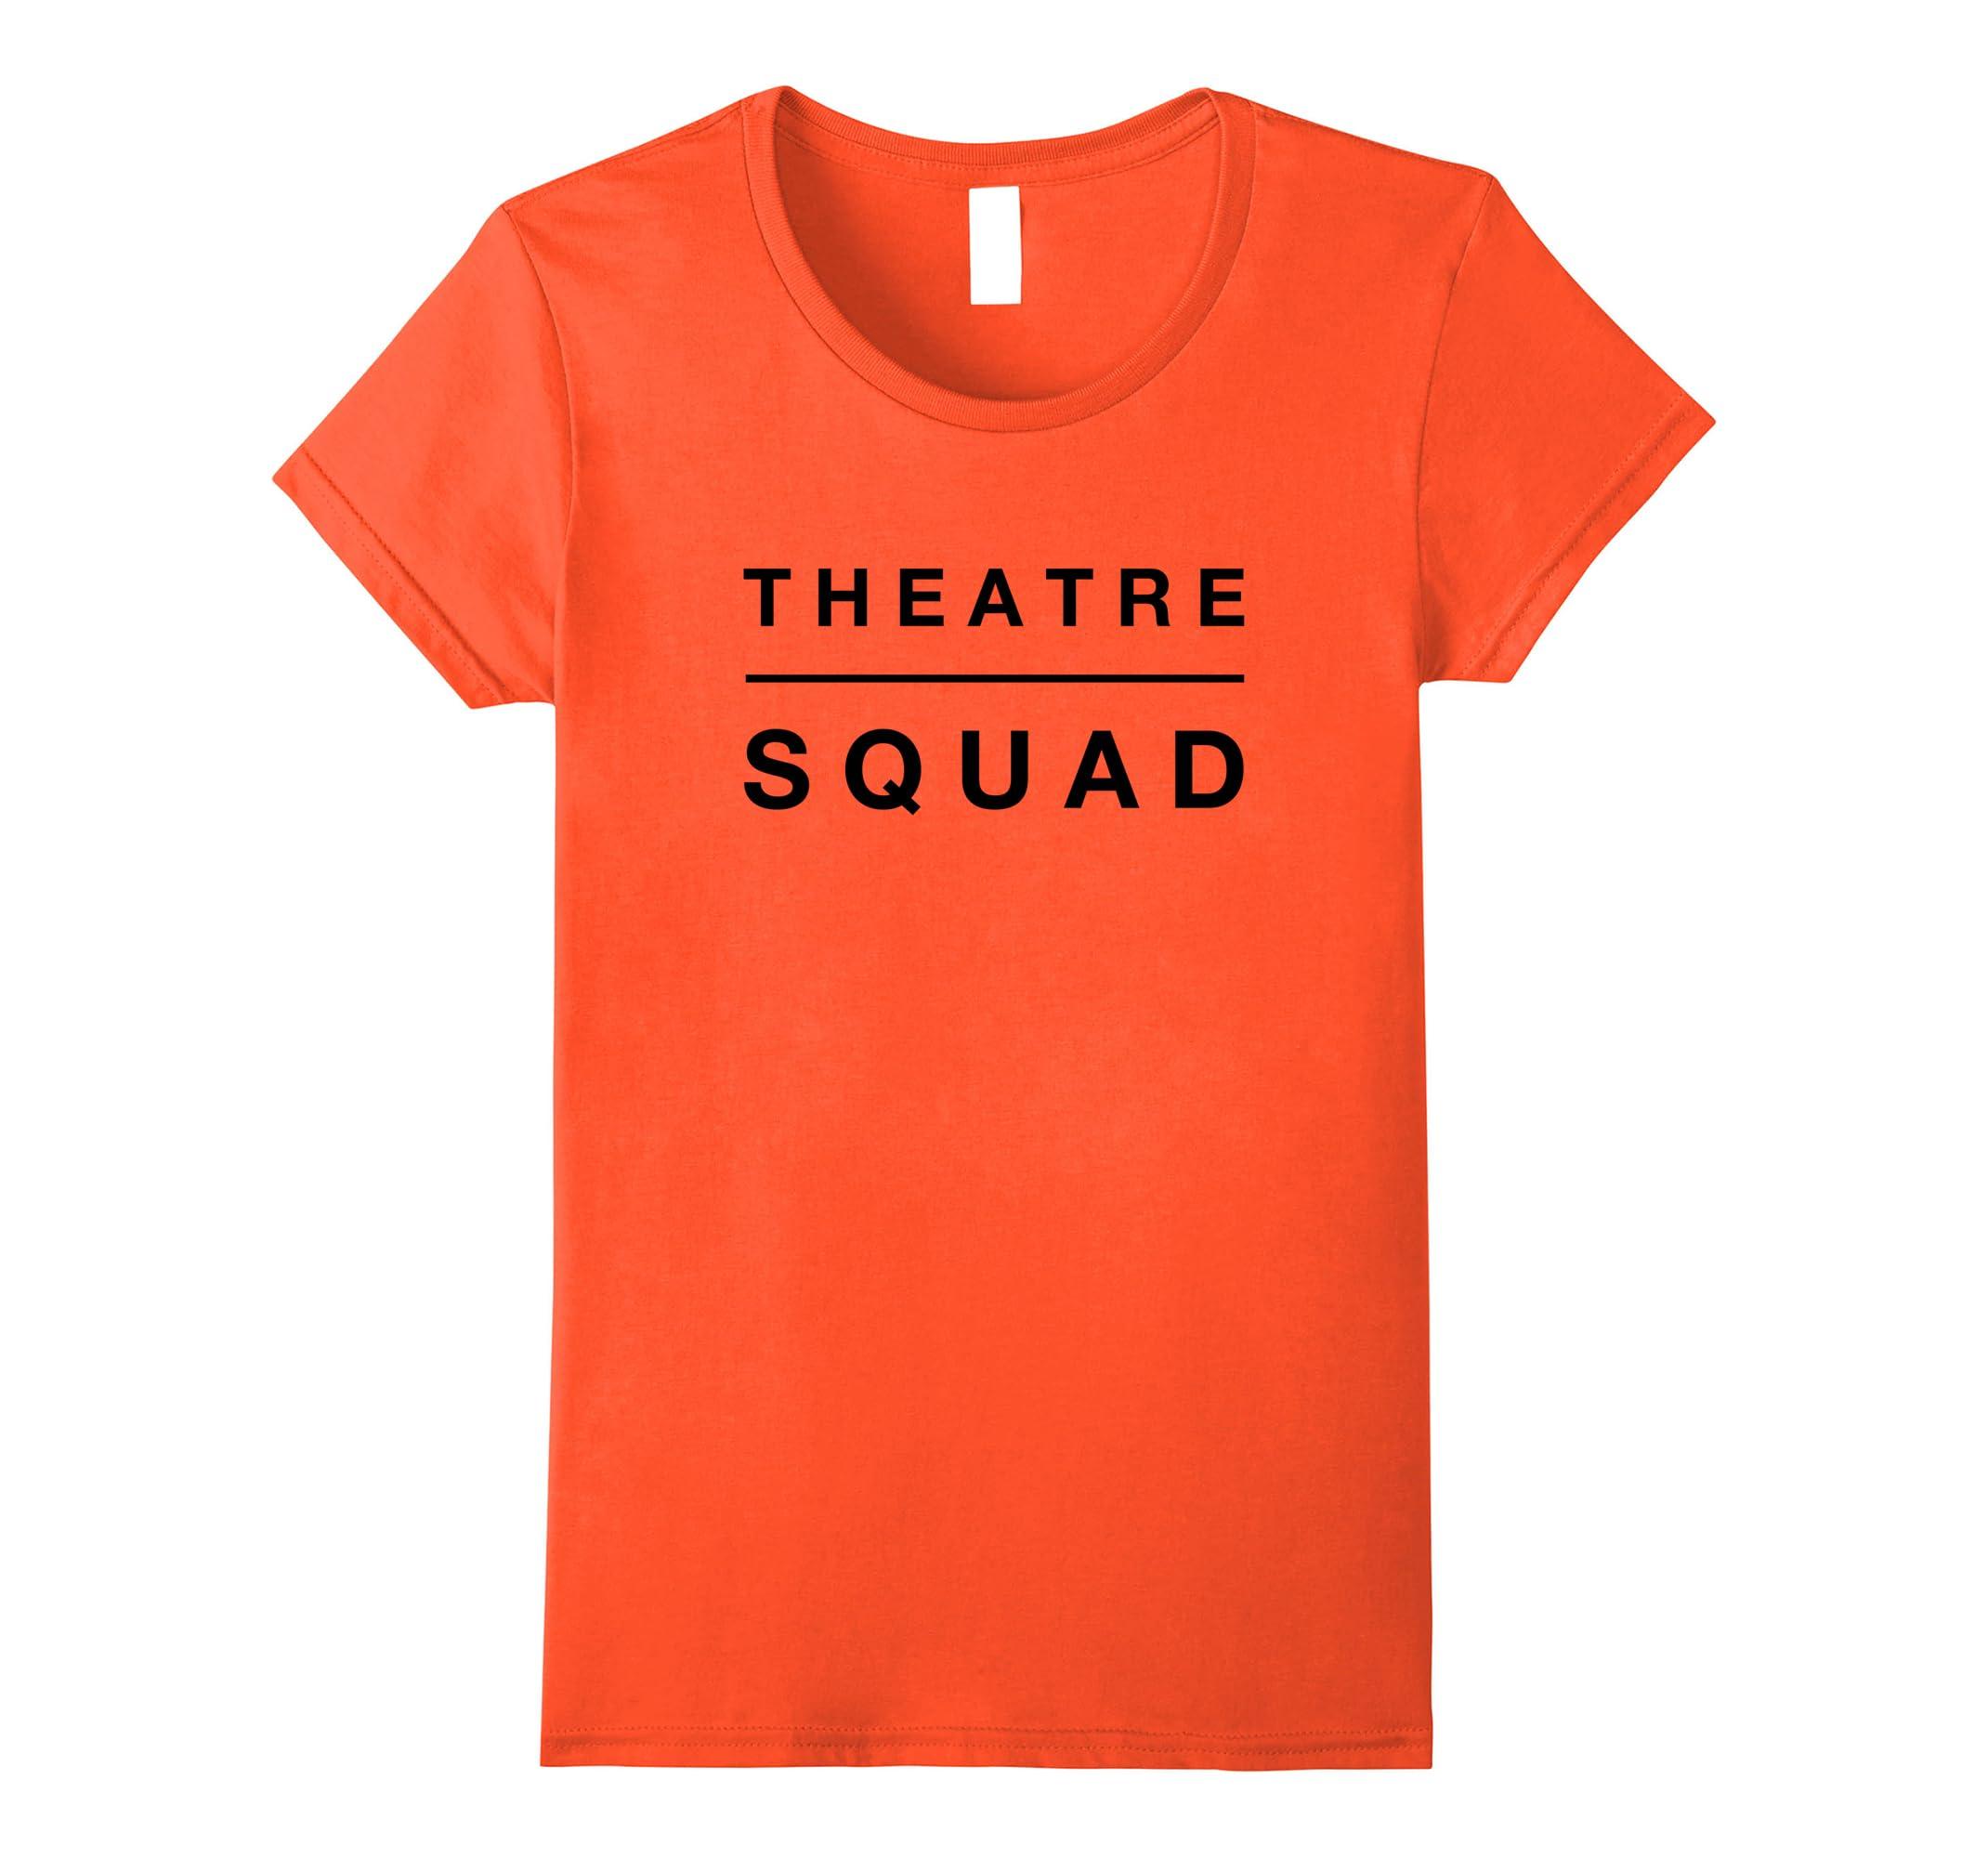 Theatre Squad Shirts Club Funny-Samdetee